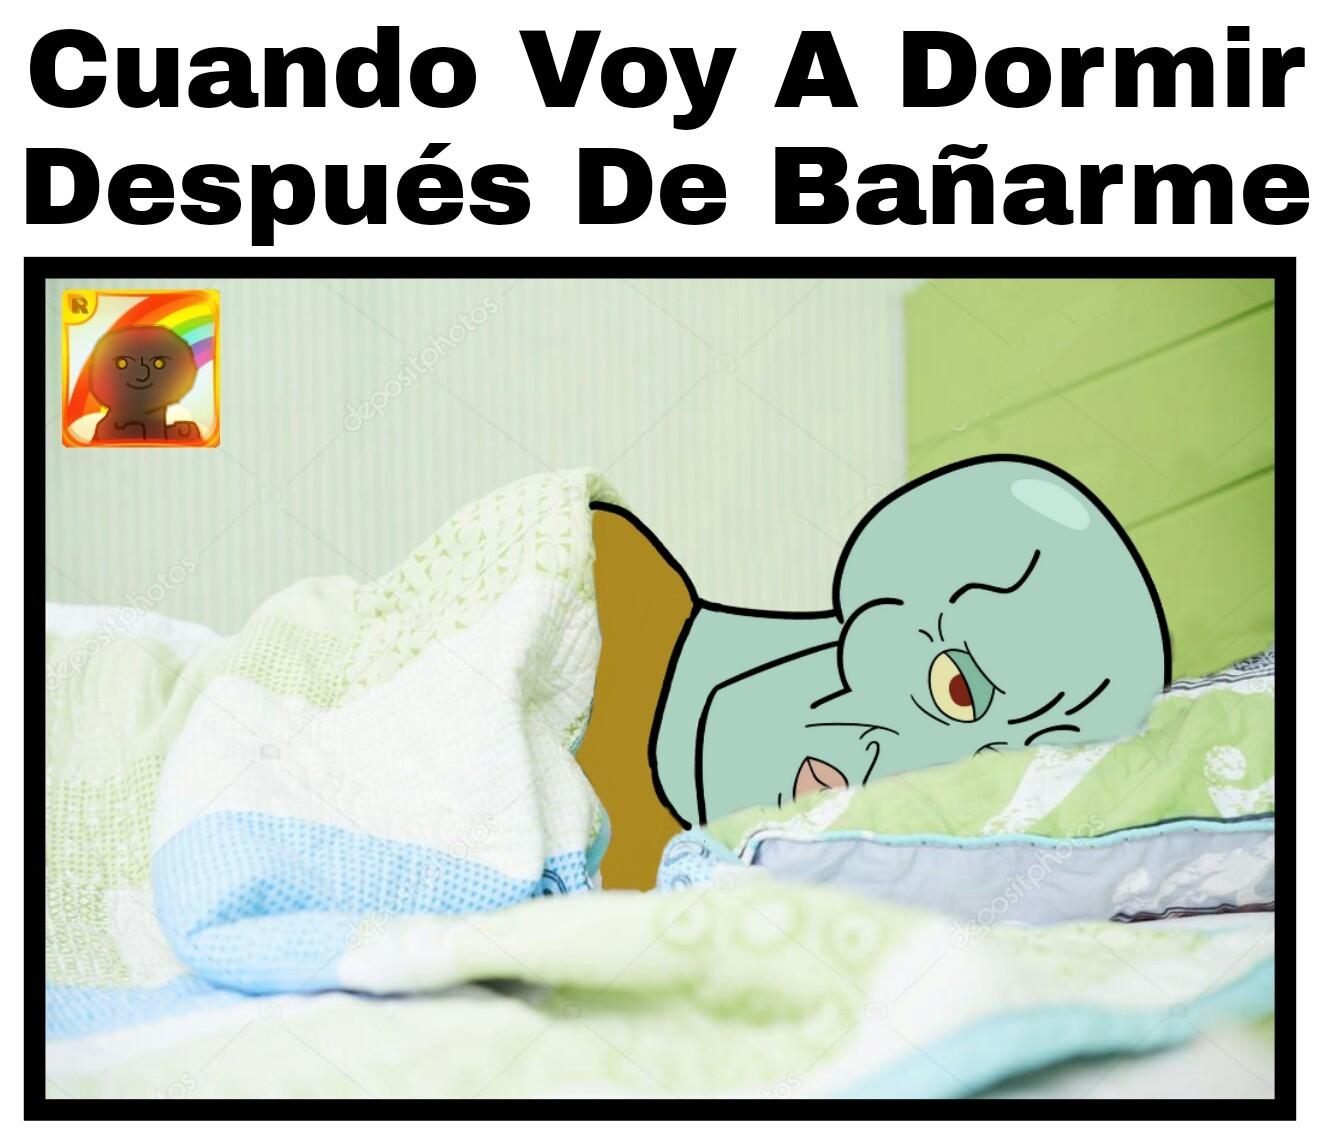 Dormir - meme